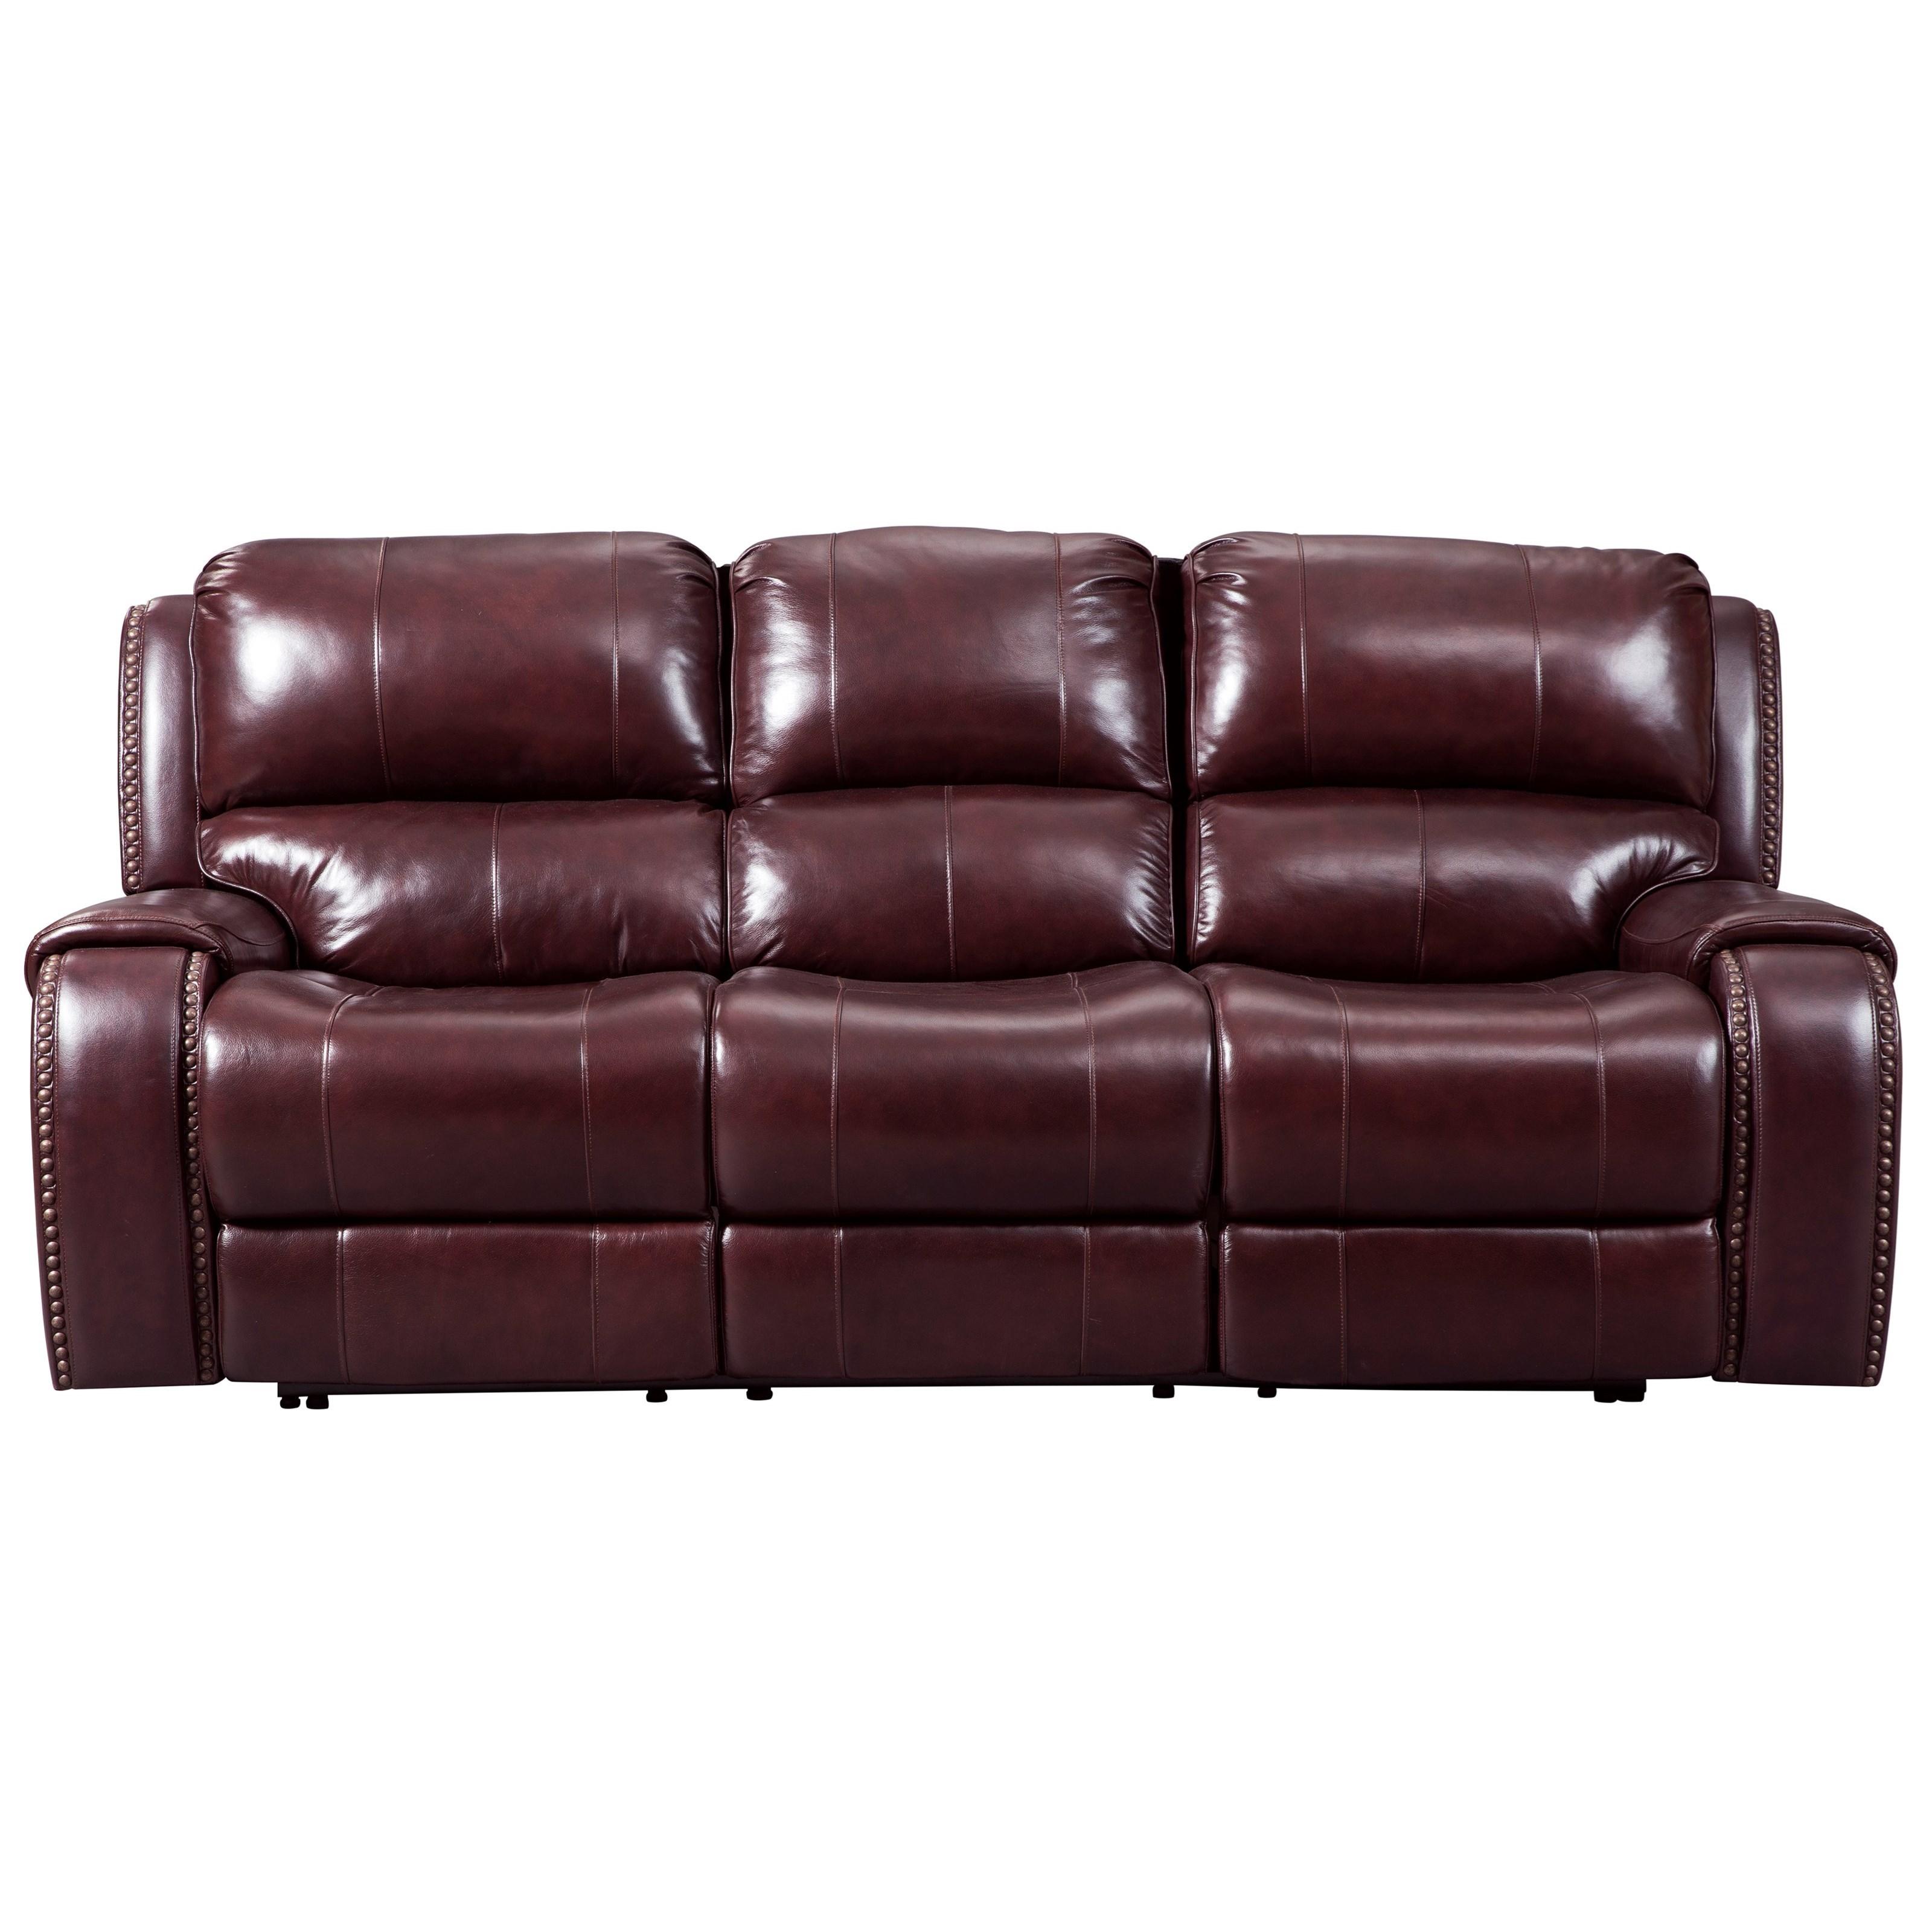 Signature Design by Ashley Gilmanton Power Reclining Sofa w/ Adjustable Headrest - Item Number: 7360615